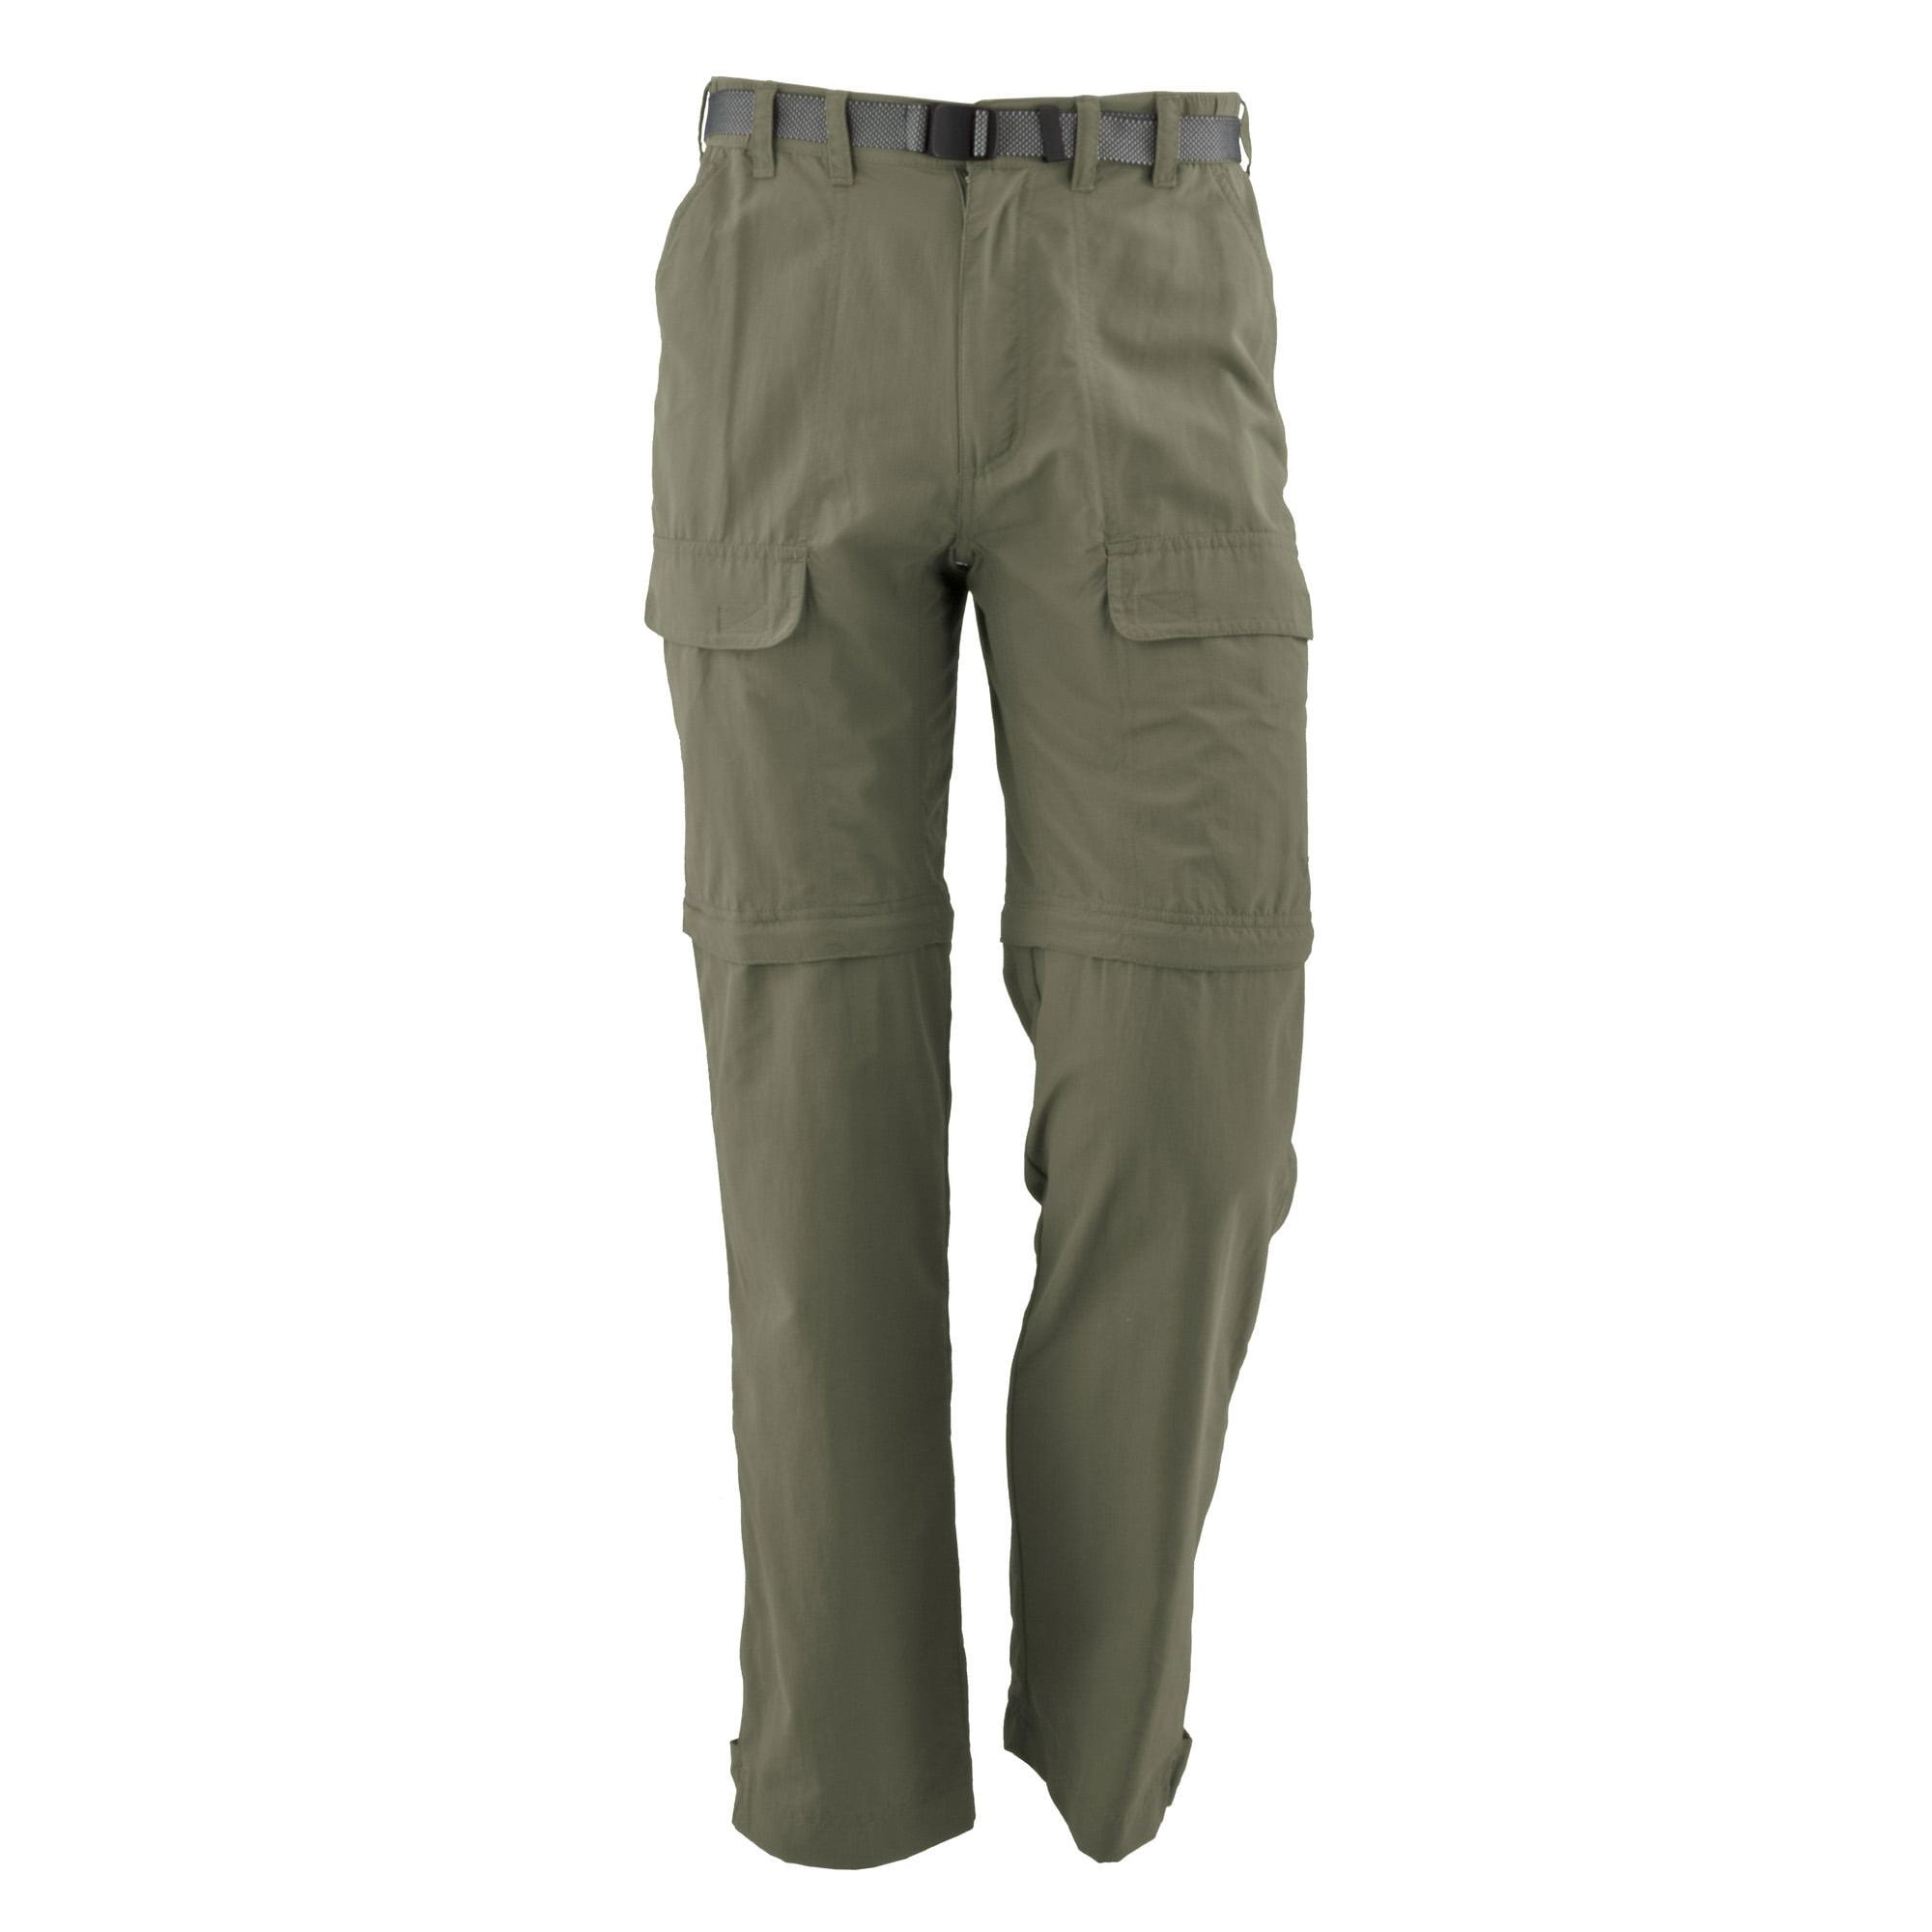 White Sierra Pt 29 inseam Convertible Pants Medium Vintage Indigo